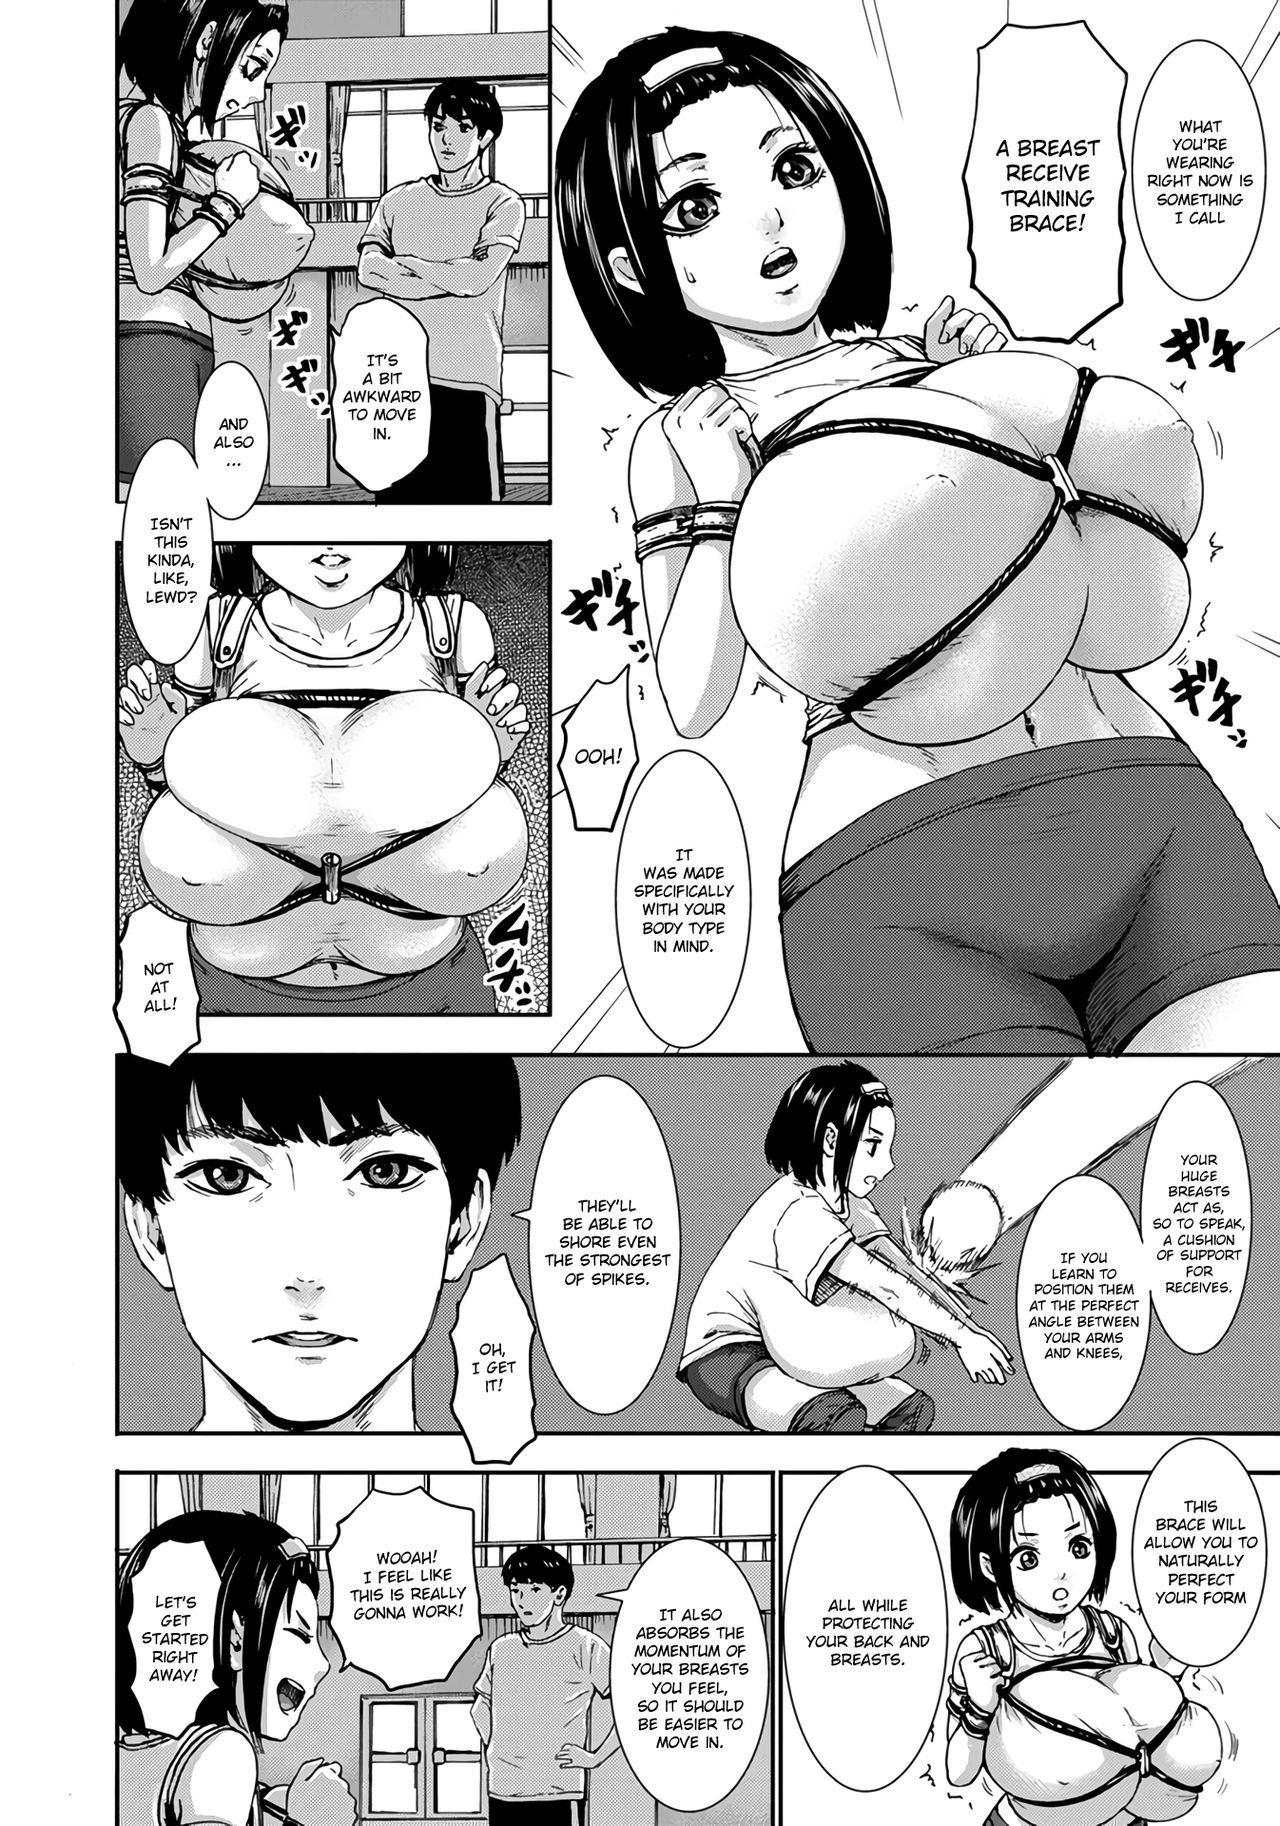 Chounyuu Gakuen | Academy For Huge Breasts 51